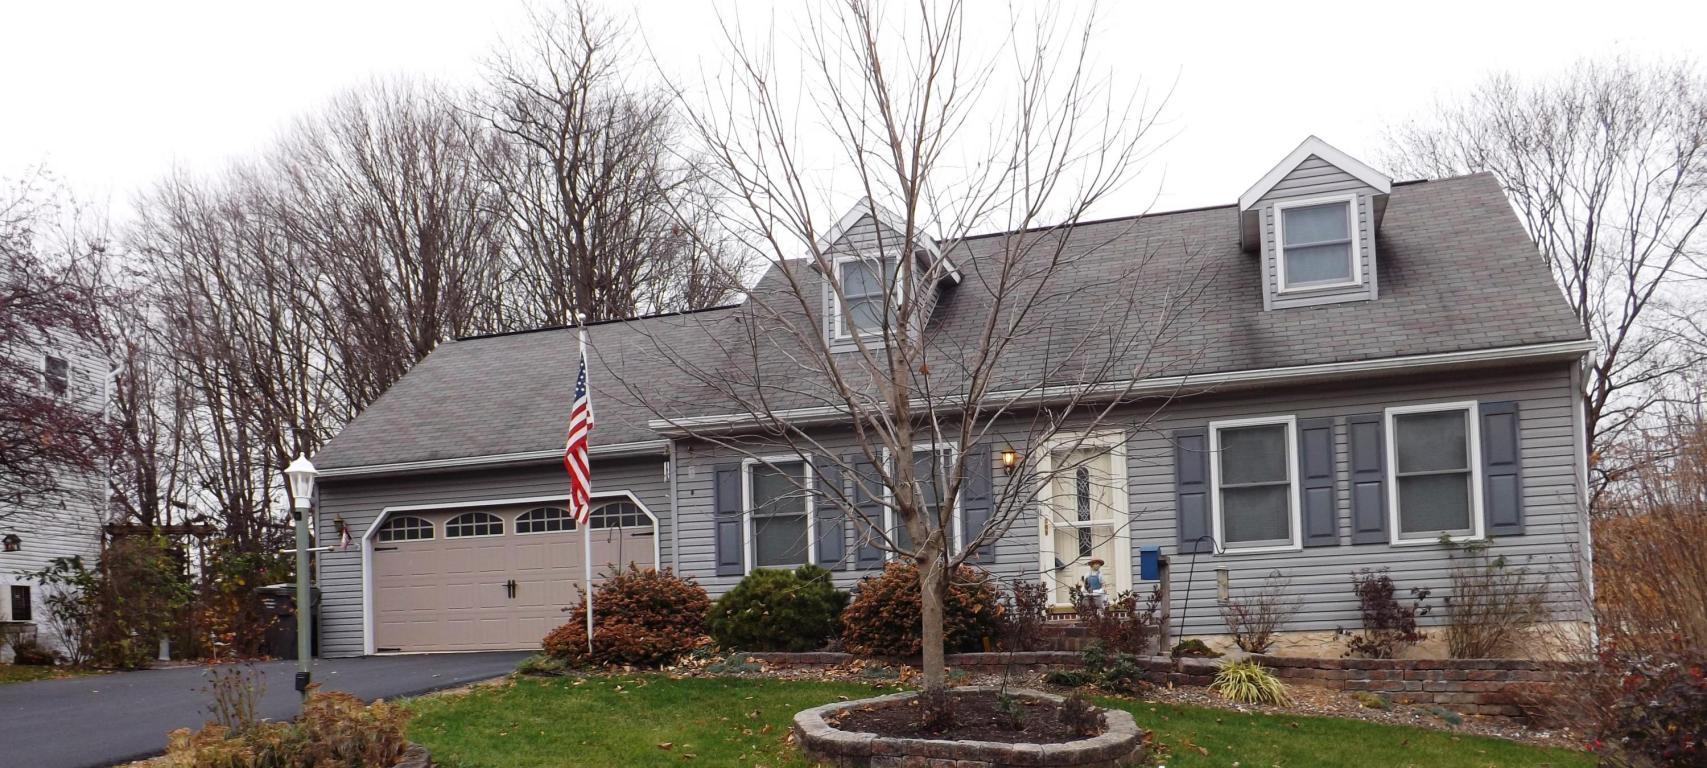 38 Ingham Drive, Stevens, PA 17578